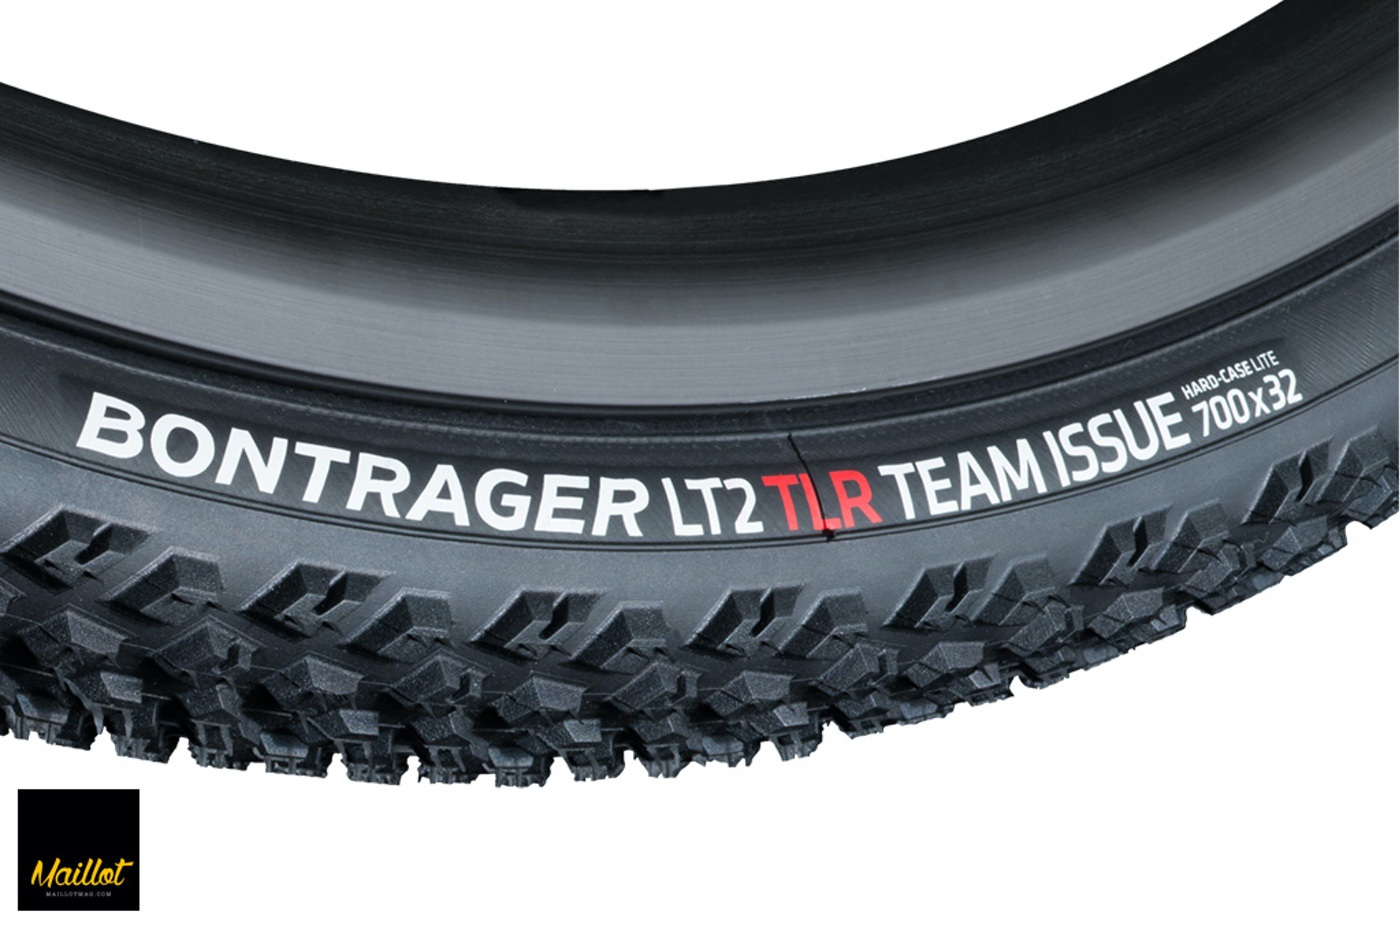 Bontrager LT2 Team Issue TLR, la cubierta para gravel